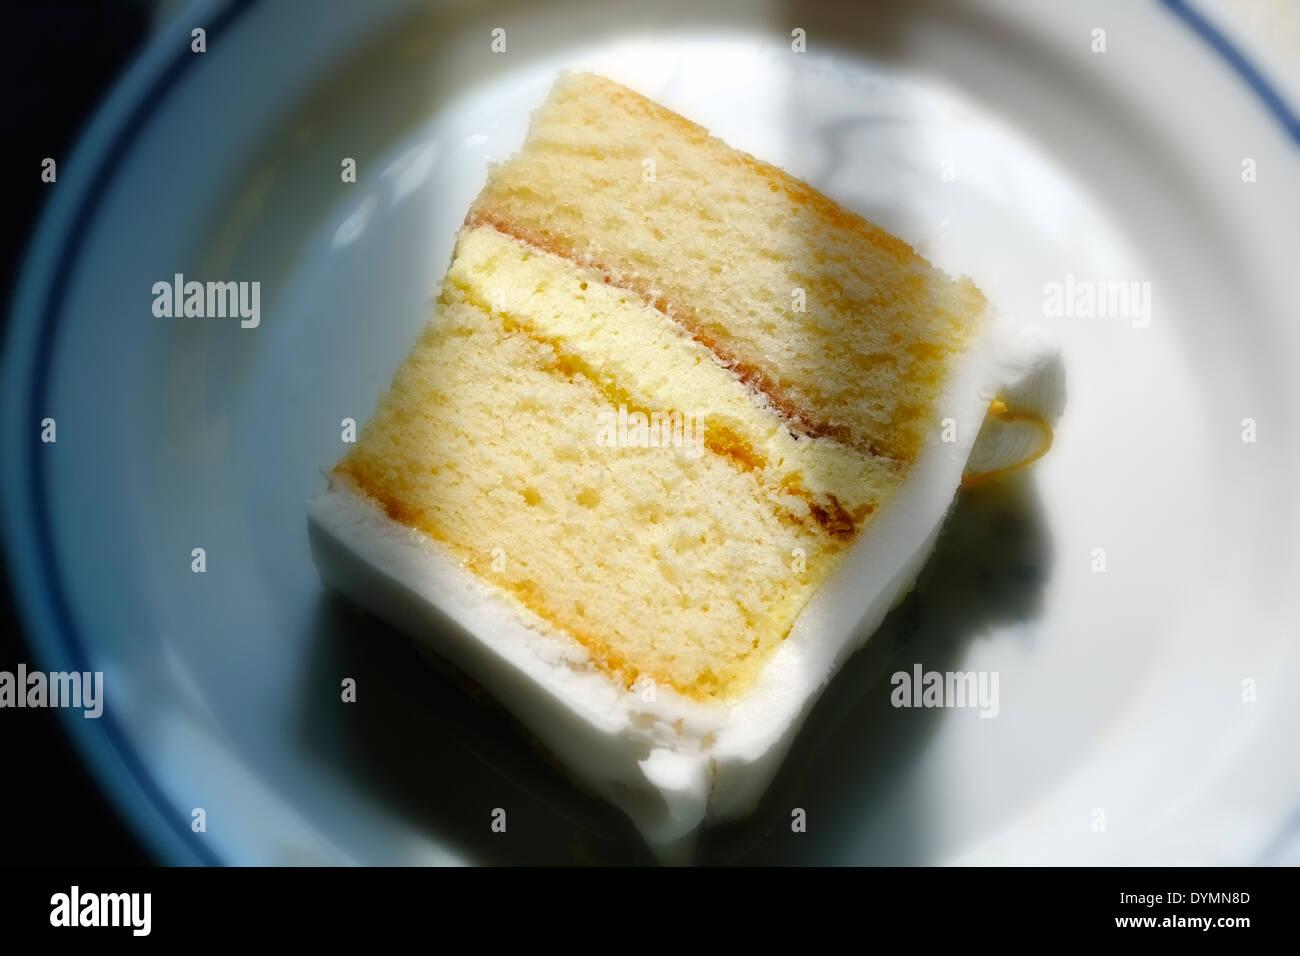 Unhealthy Sponge Cake